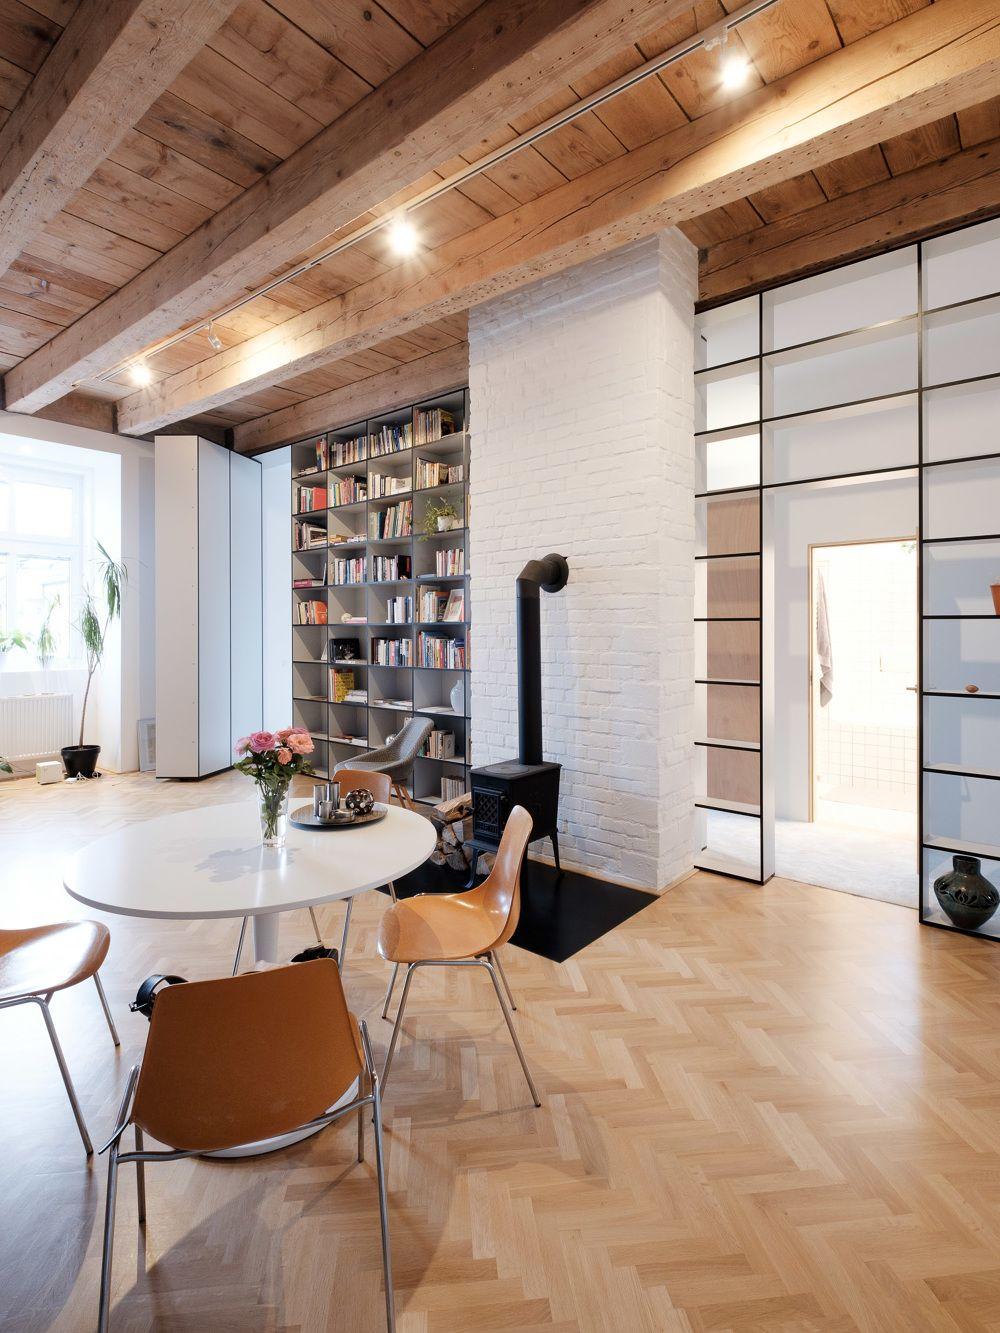 TRNuRekonštrukcia bytu  JRKVC  best  Pinterest  Haus und Bau